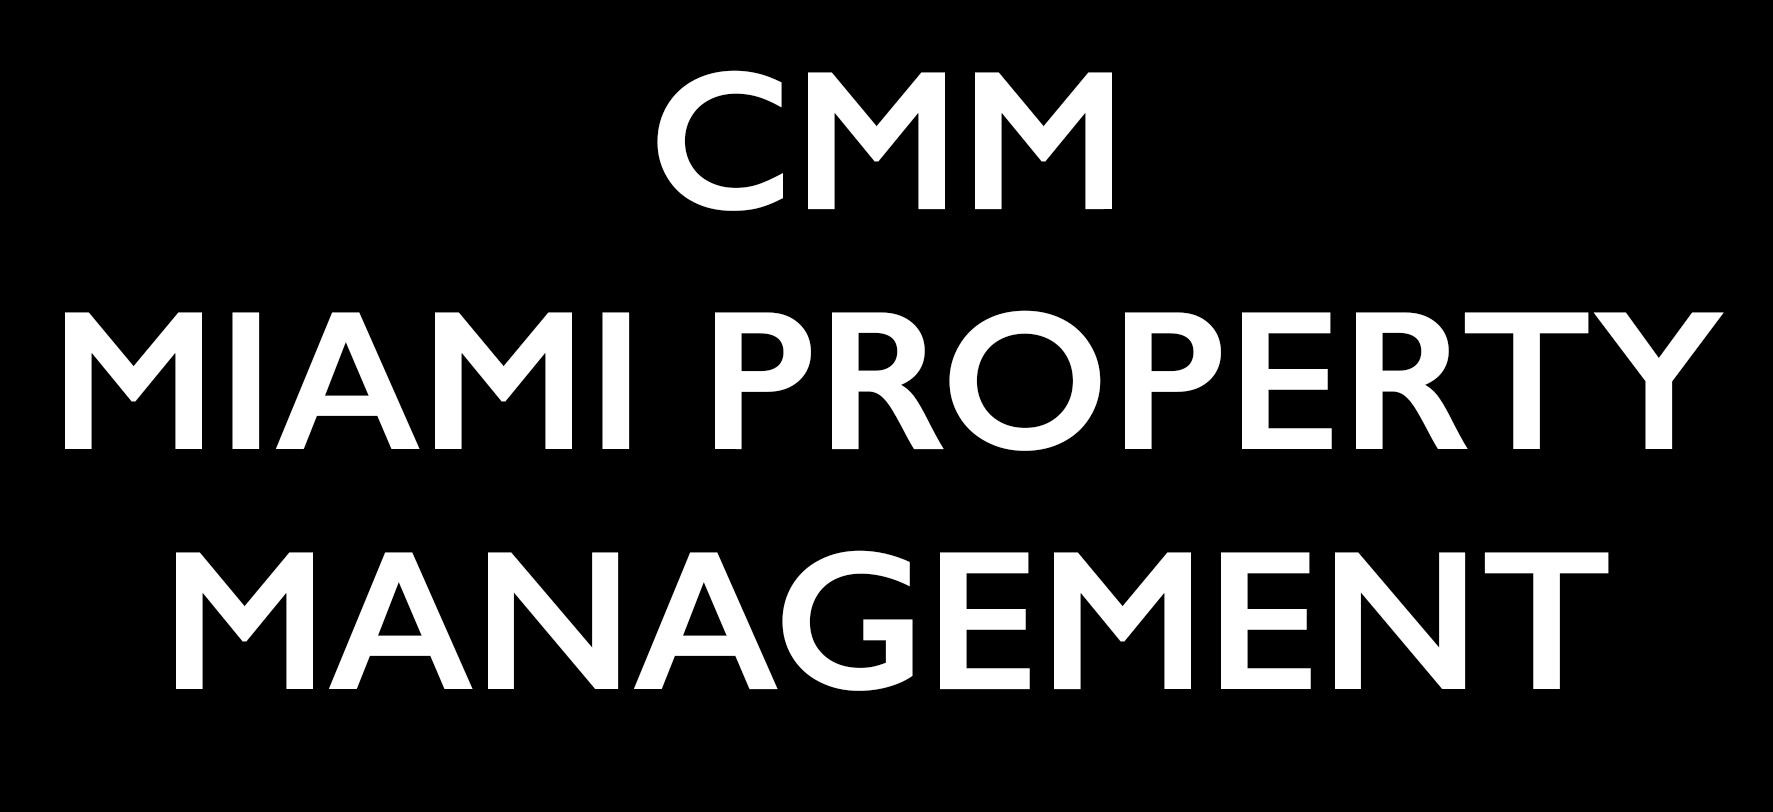 cmm Miami Property Management